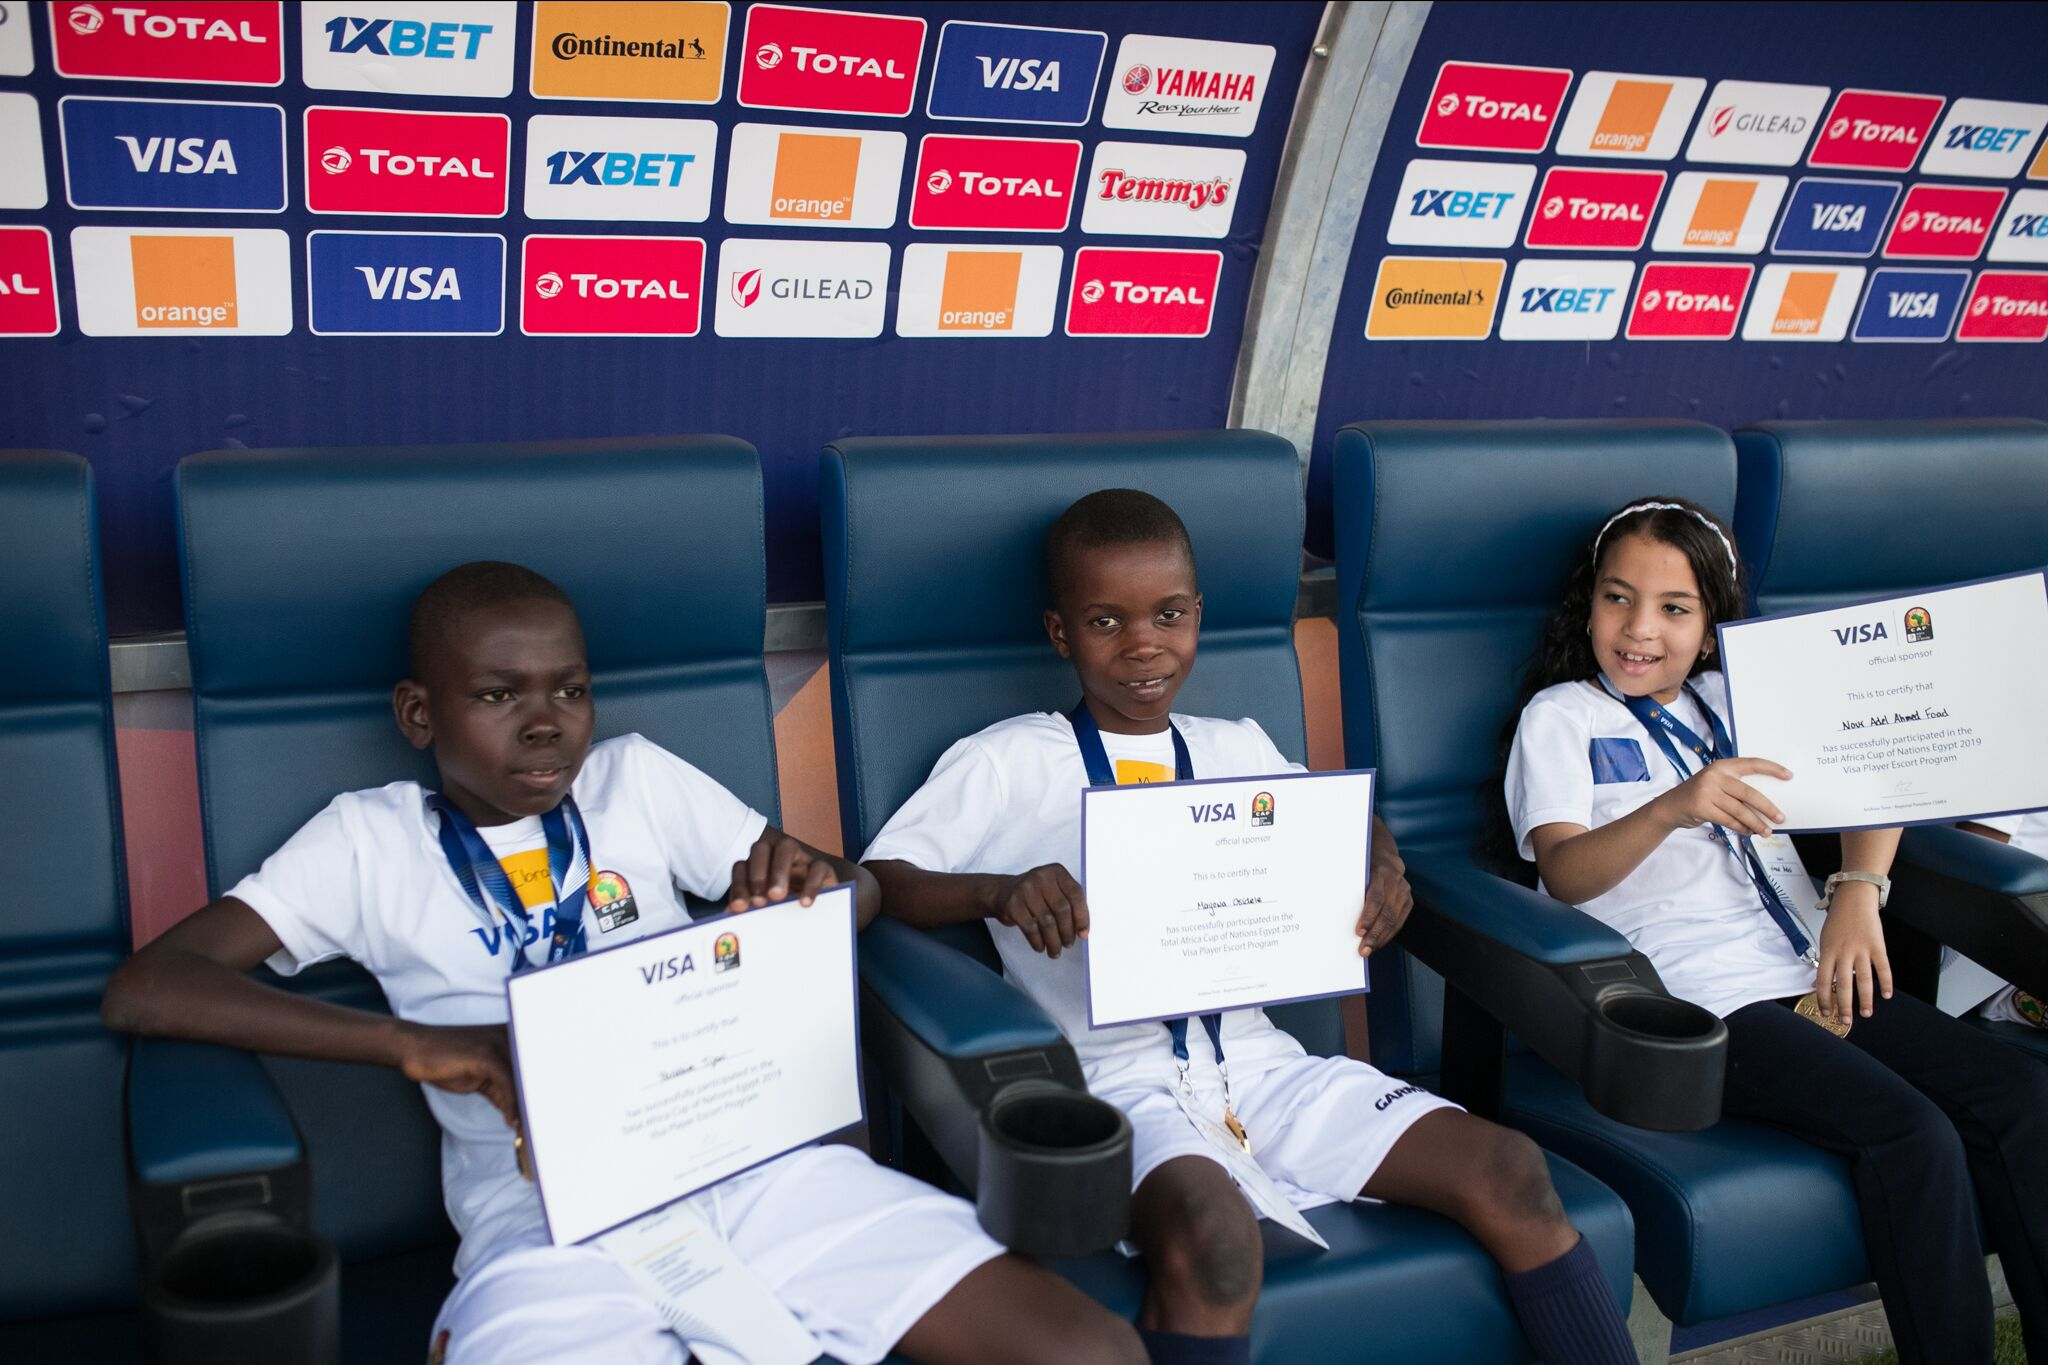 Visa Player Escort Programme makes dreams come true for Nigerian children (Photos) - Brand Spur